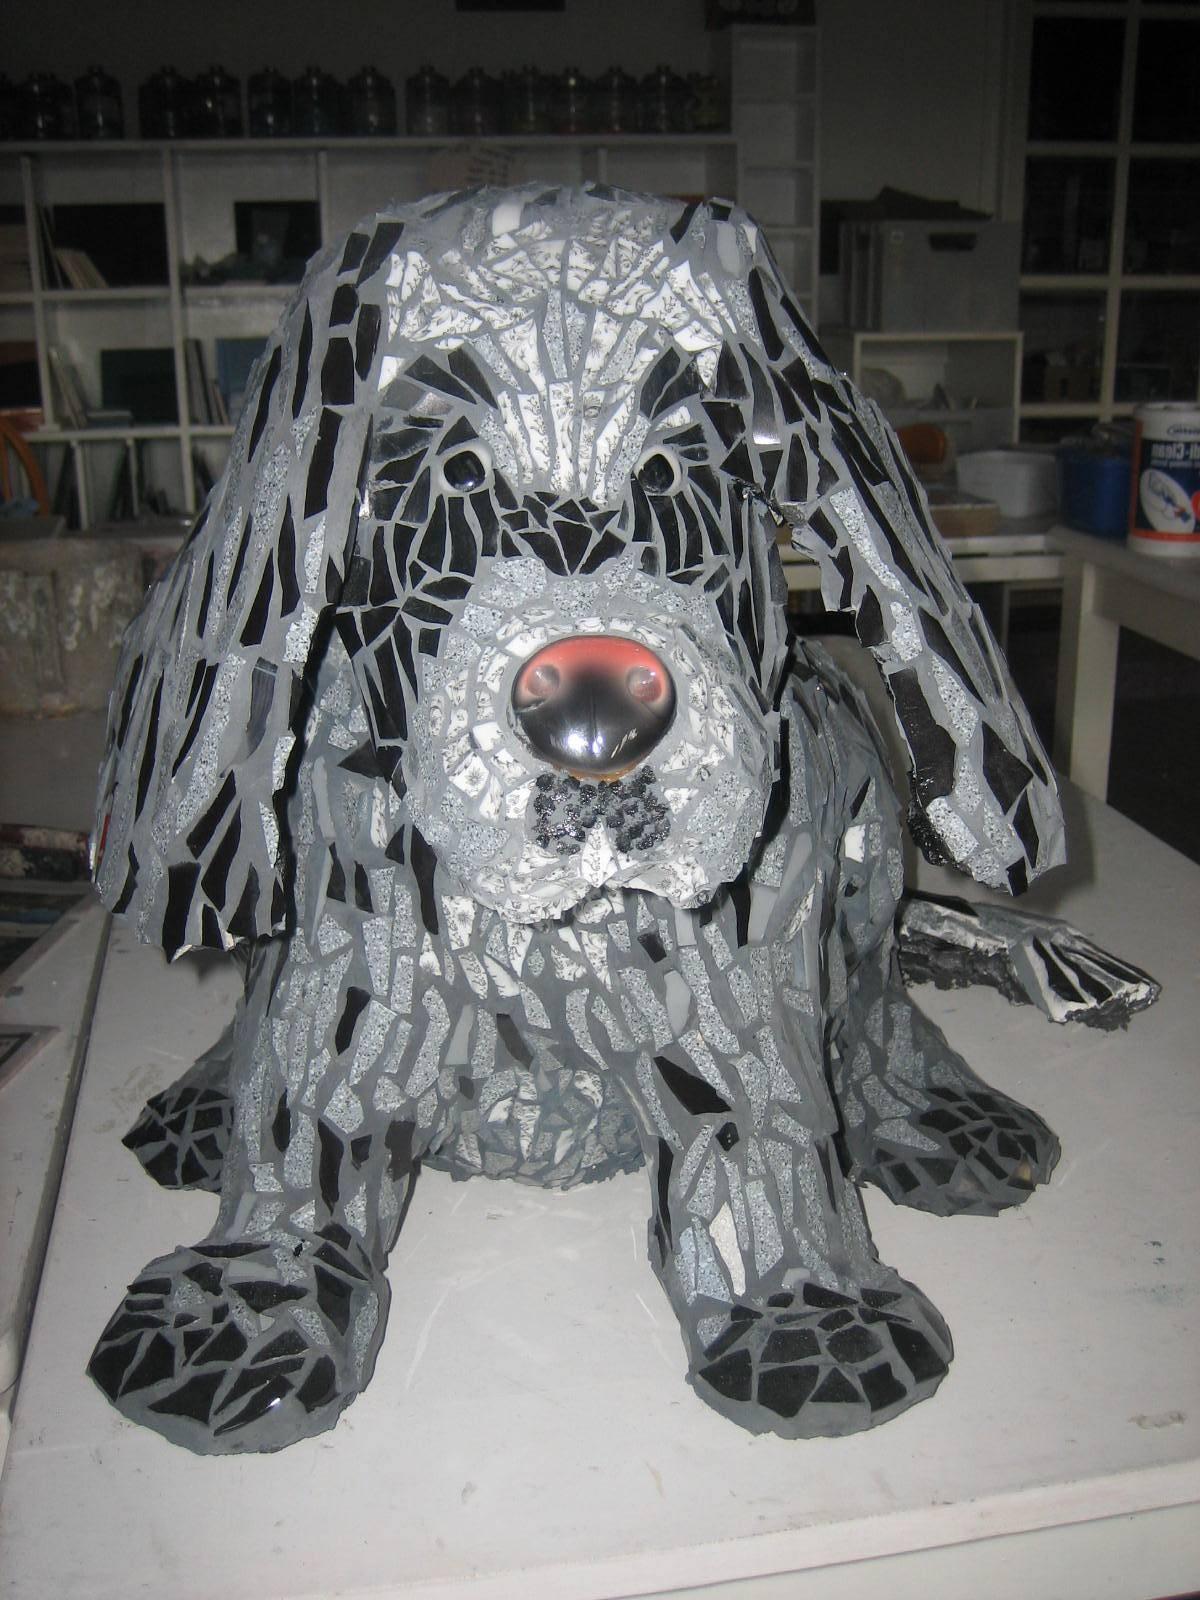 Harry the Dog